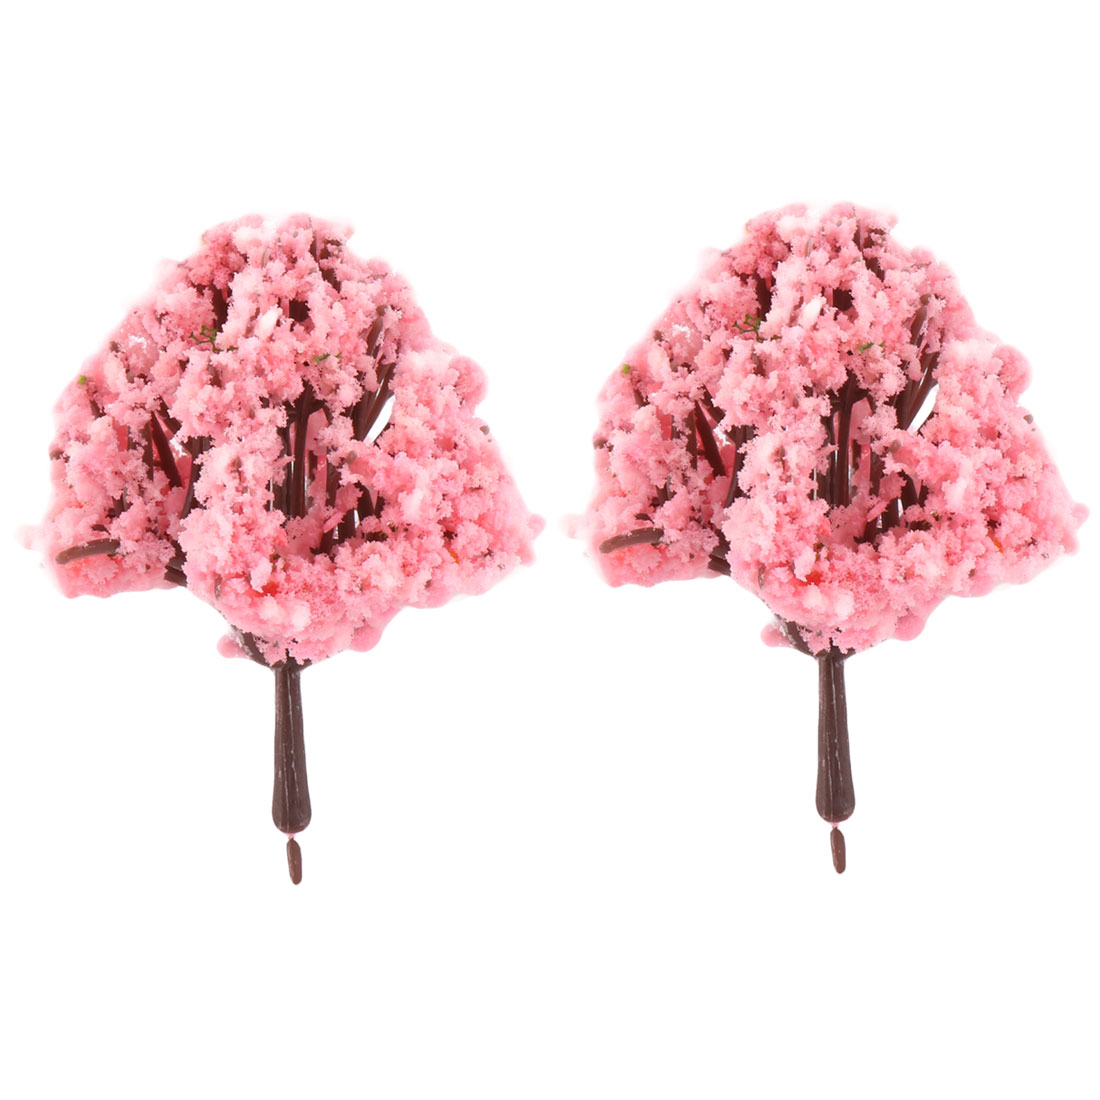 Household Garden Decor Resin Artificial Plant Tree Bonsai Landscape Pink 2 Pcs